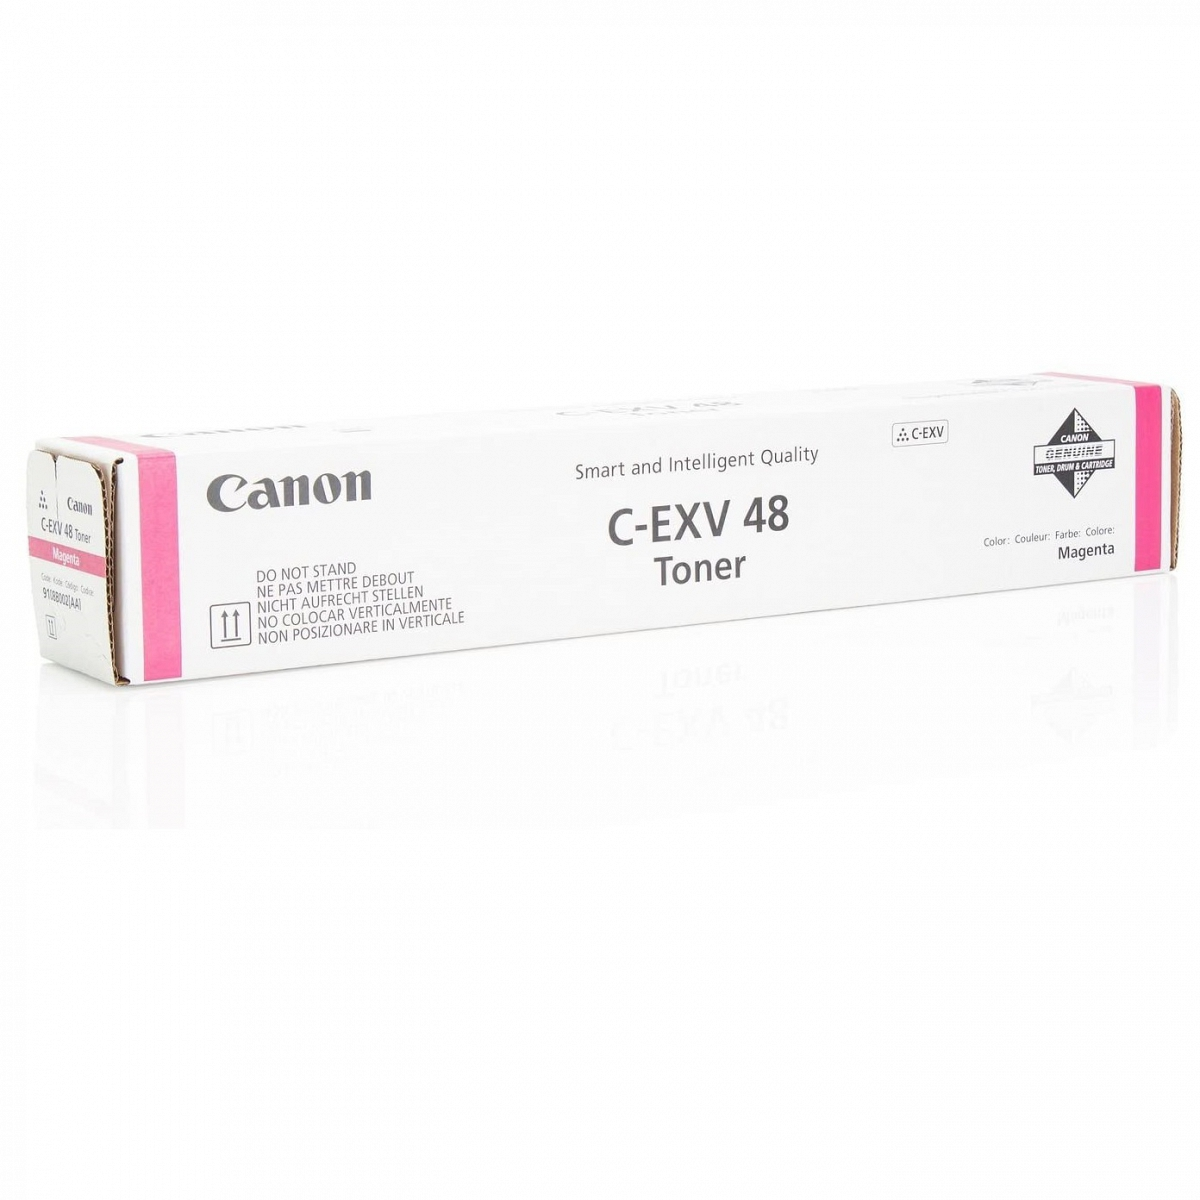 Toner Canon C-EXV 48